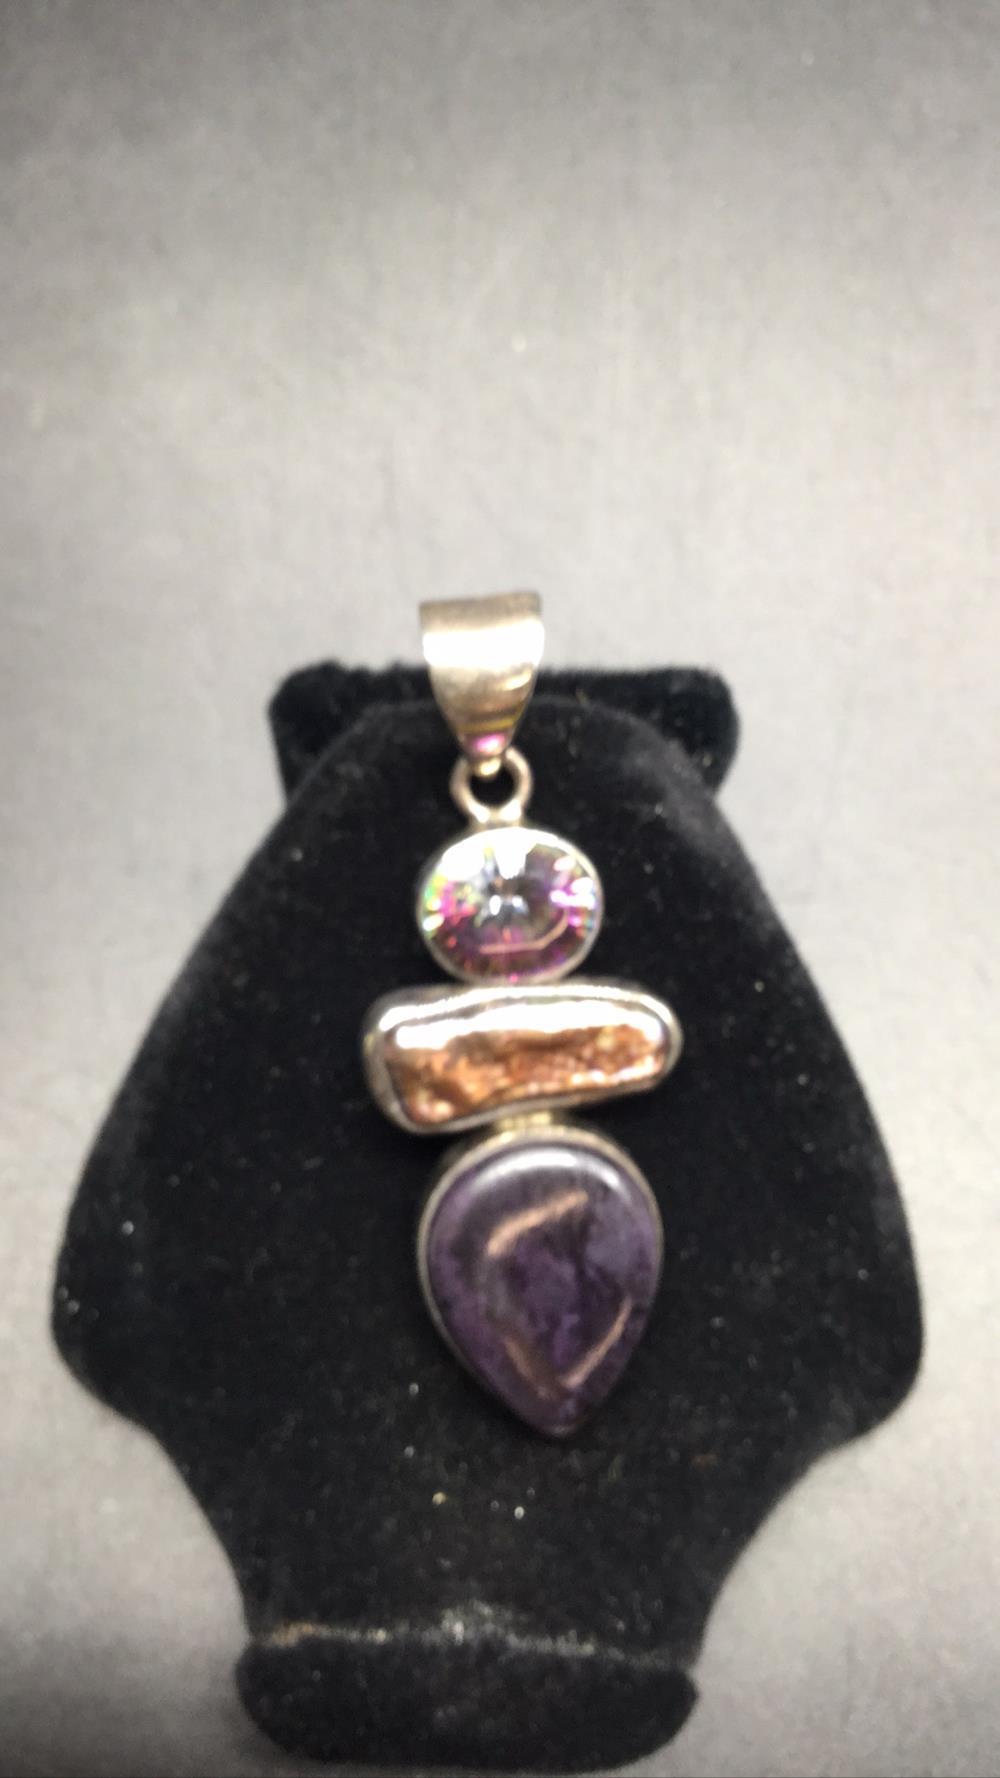 Mystic topaz abalone and amethyst pendant